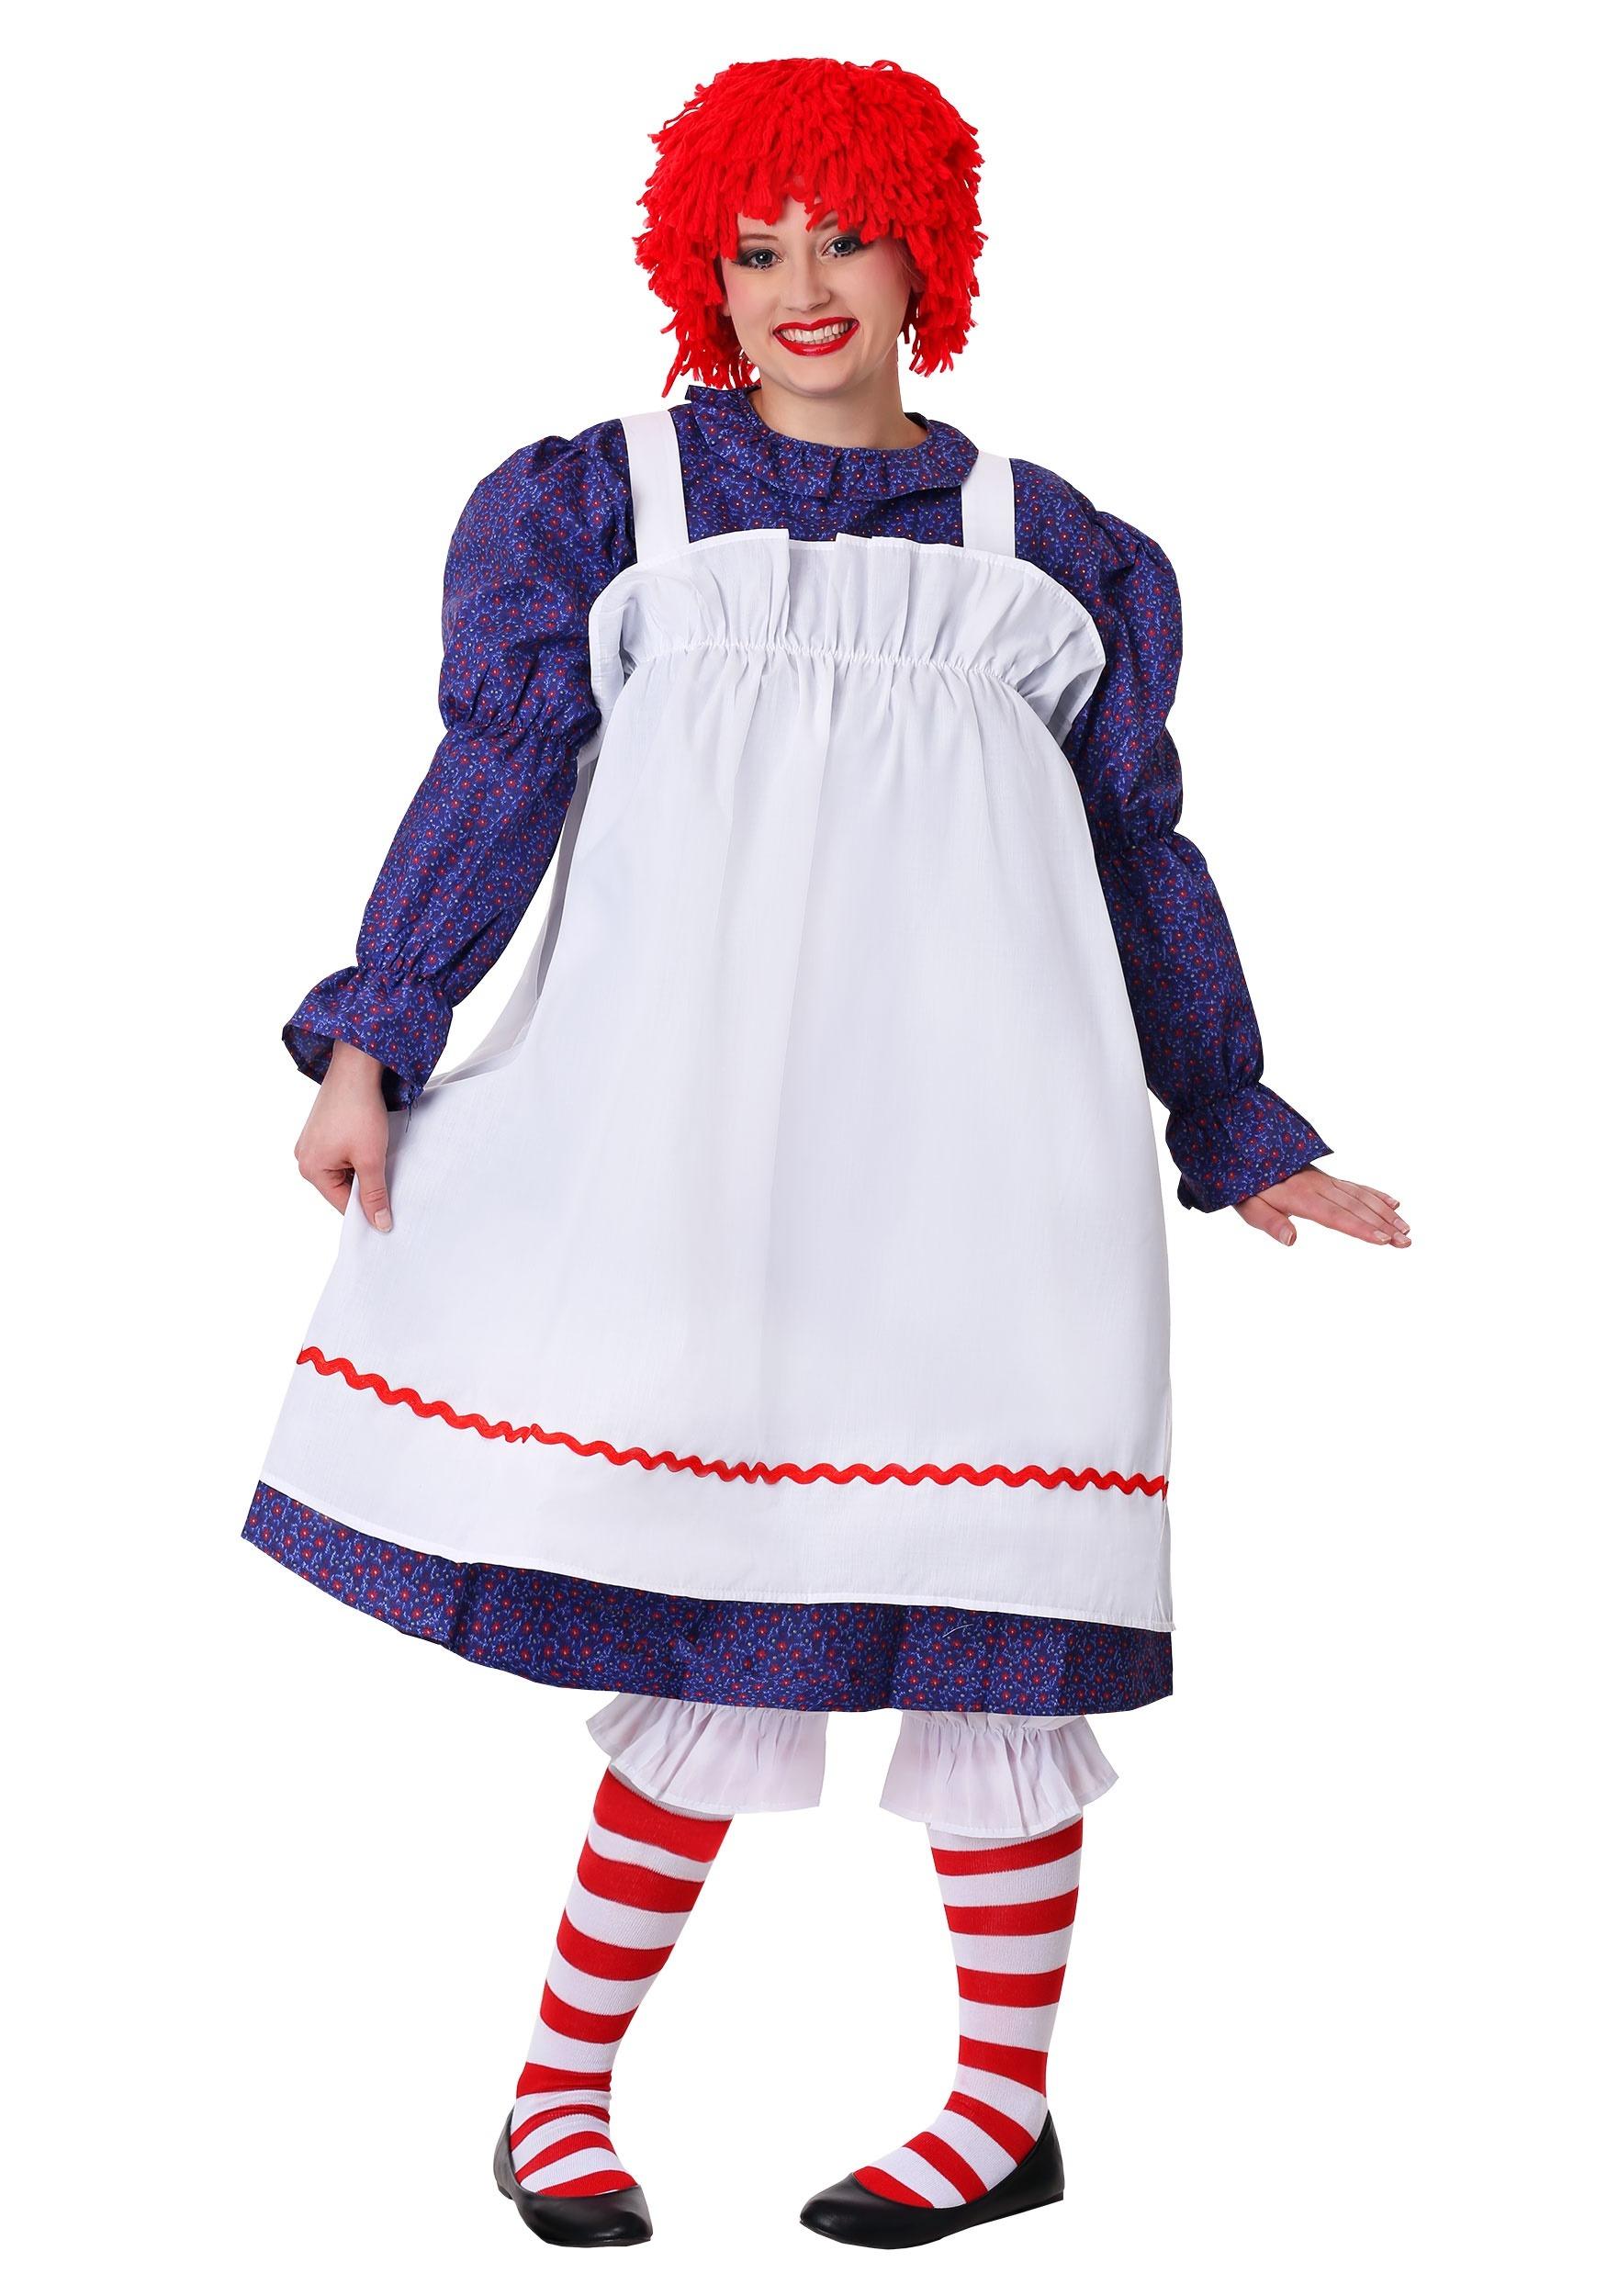 Red White Striped Socks Rag Doll Christmas Halloween Child Costume Accessory